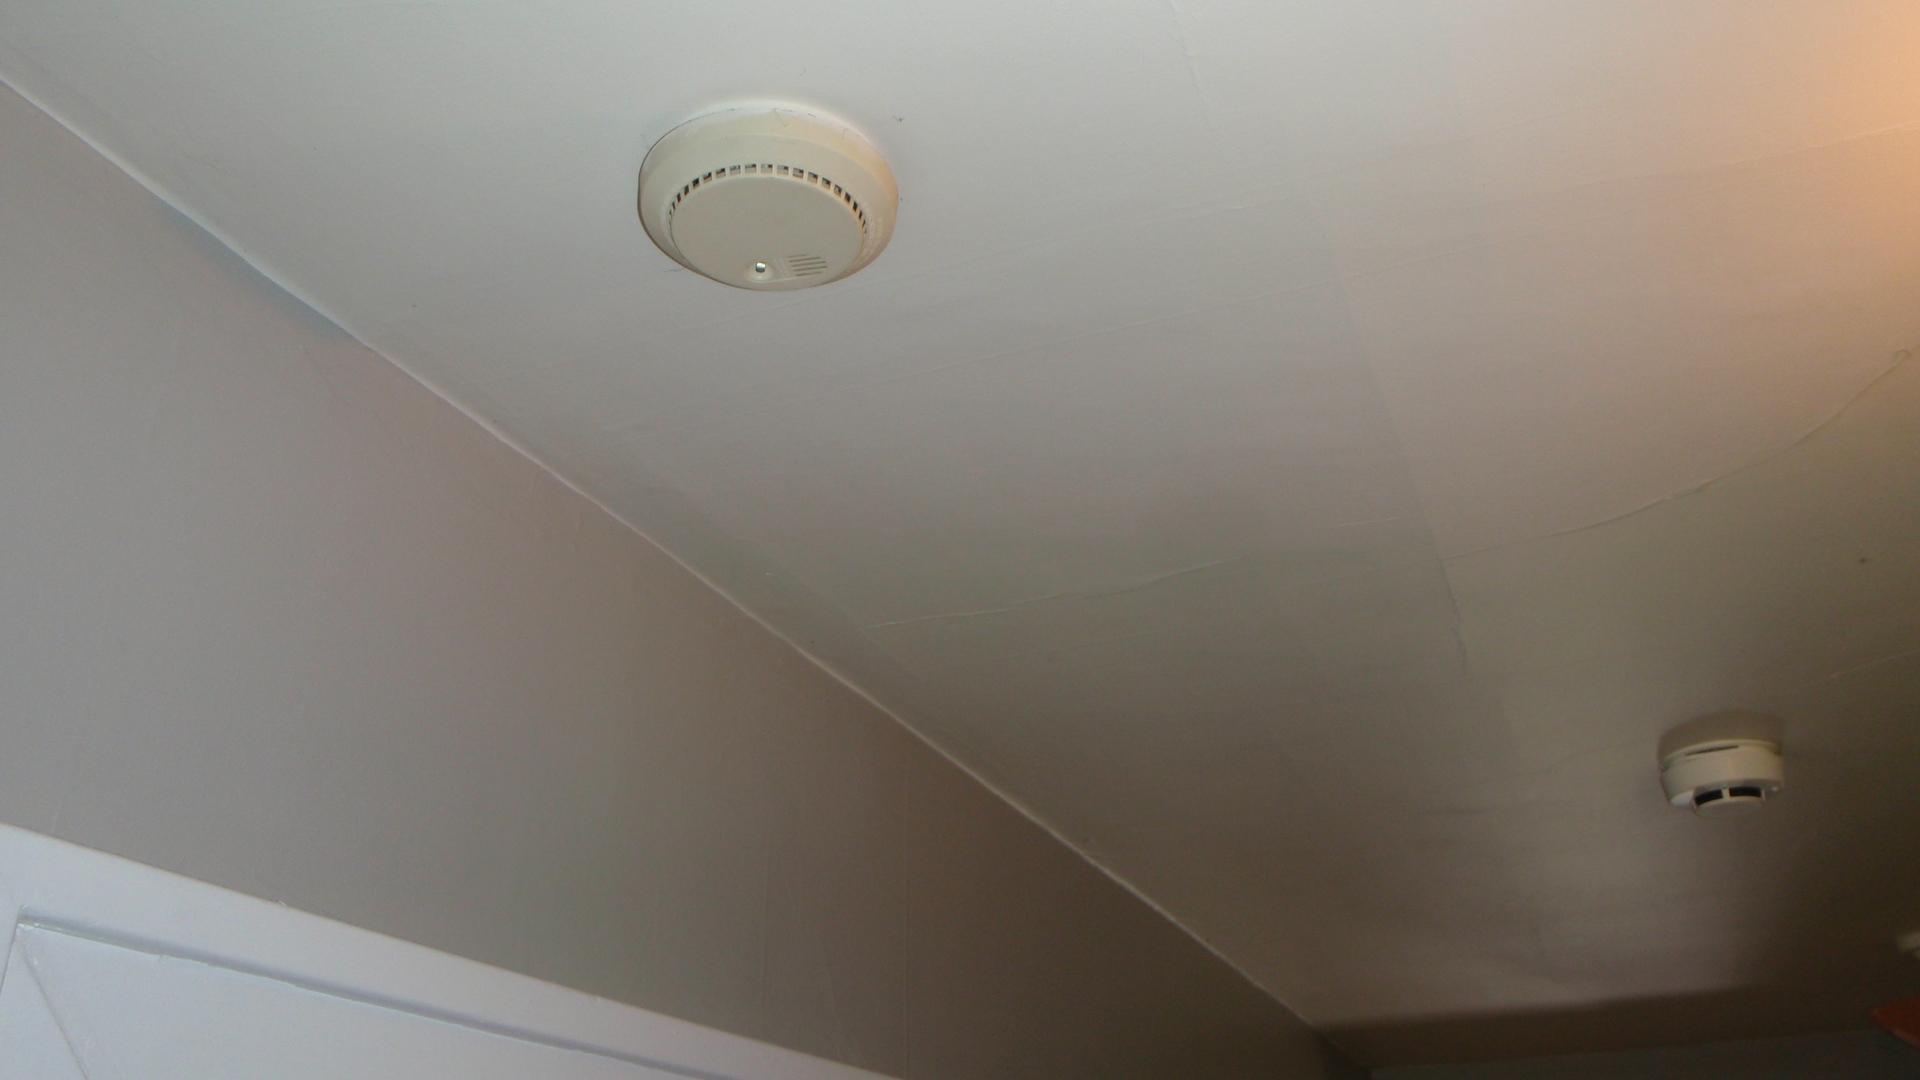 Security Alarm Noise